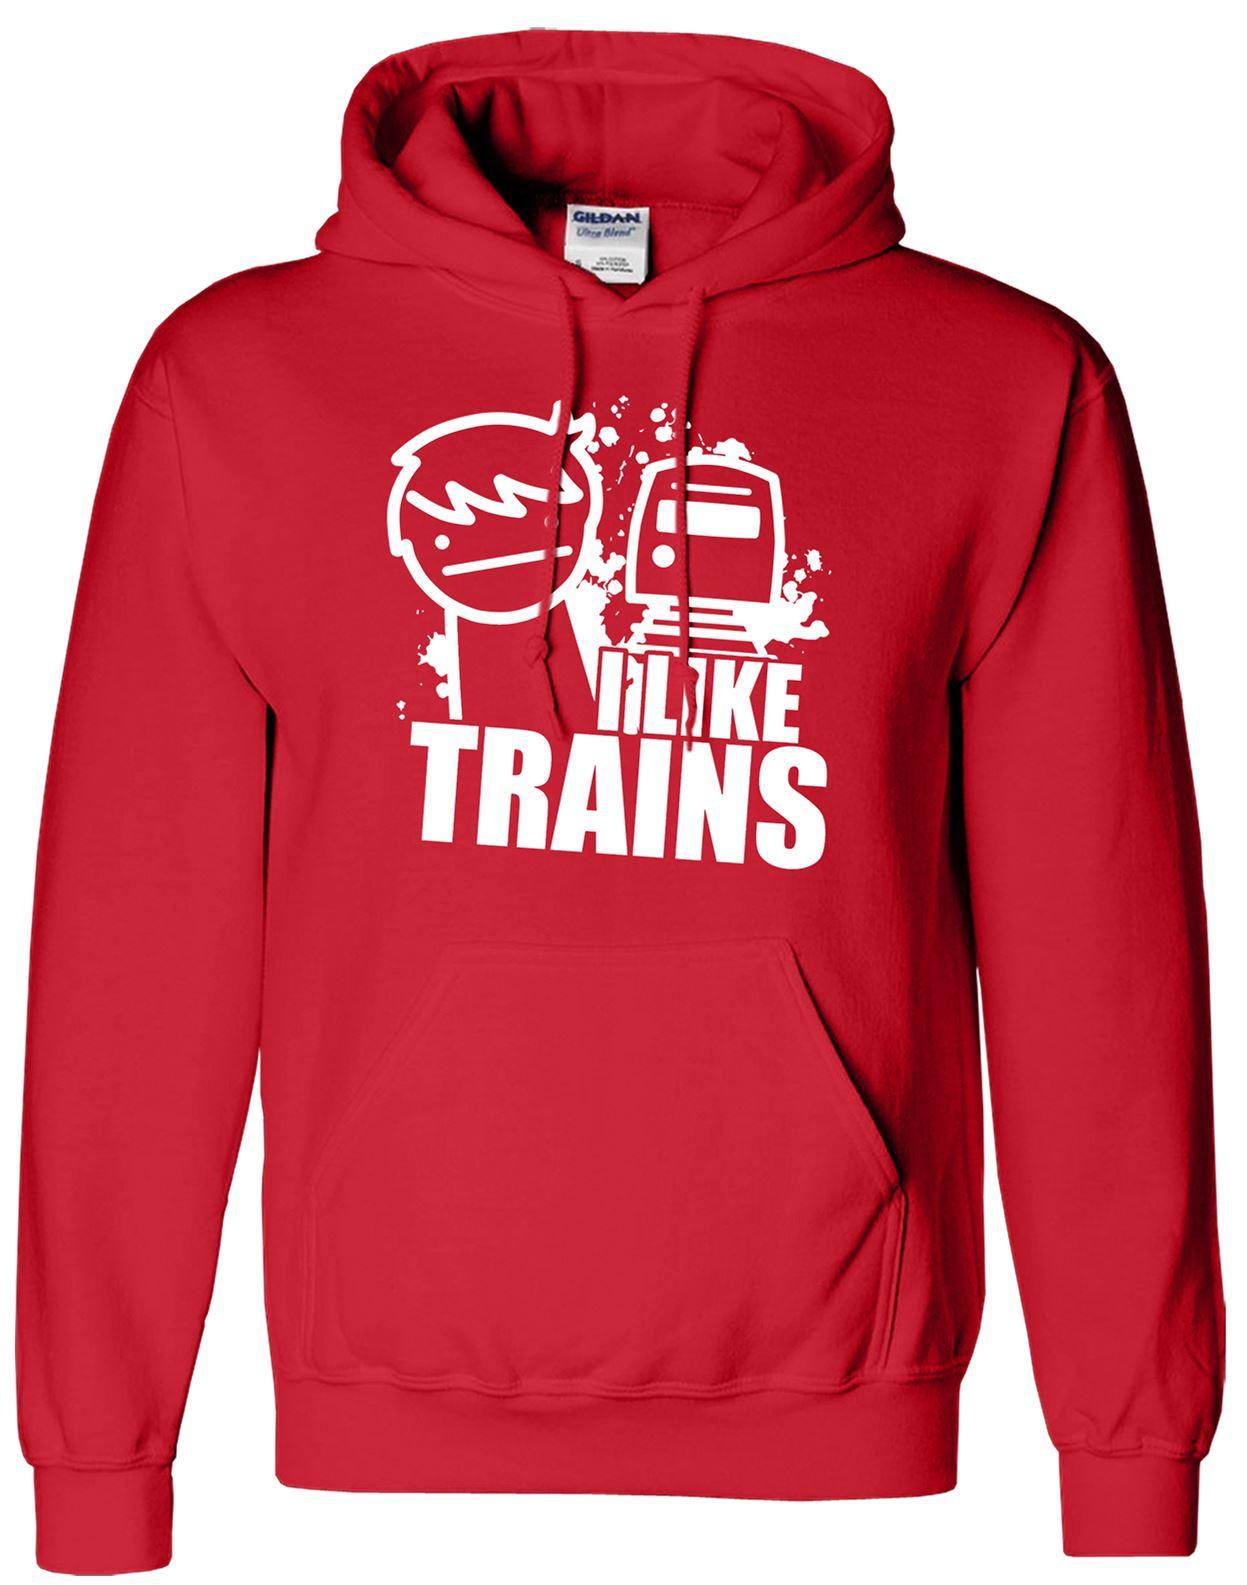 Bazinga hoodie